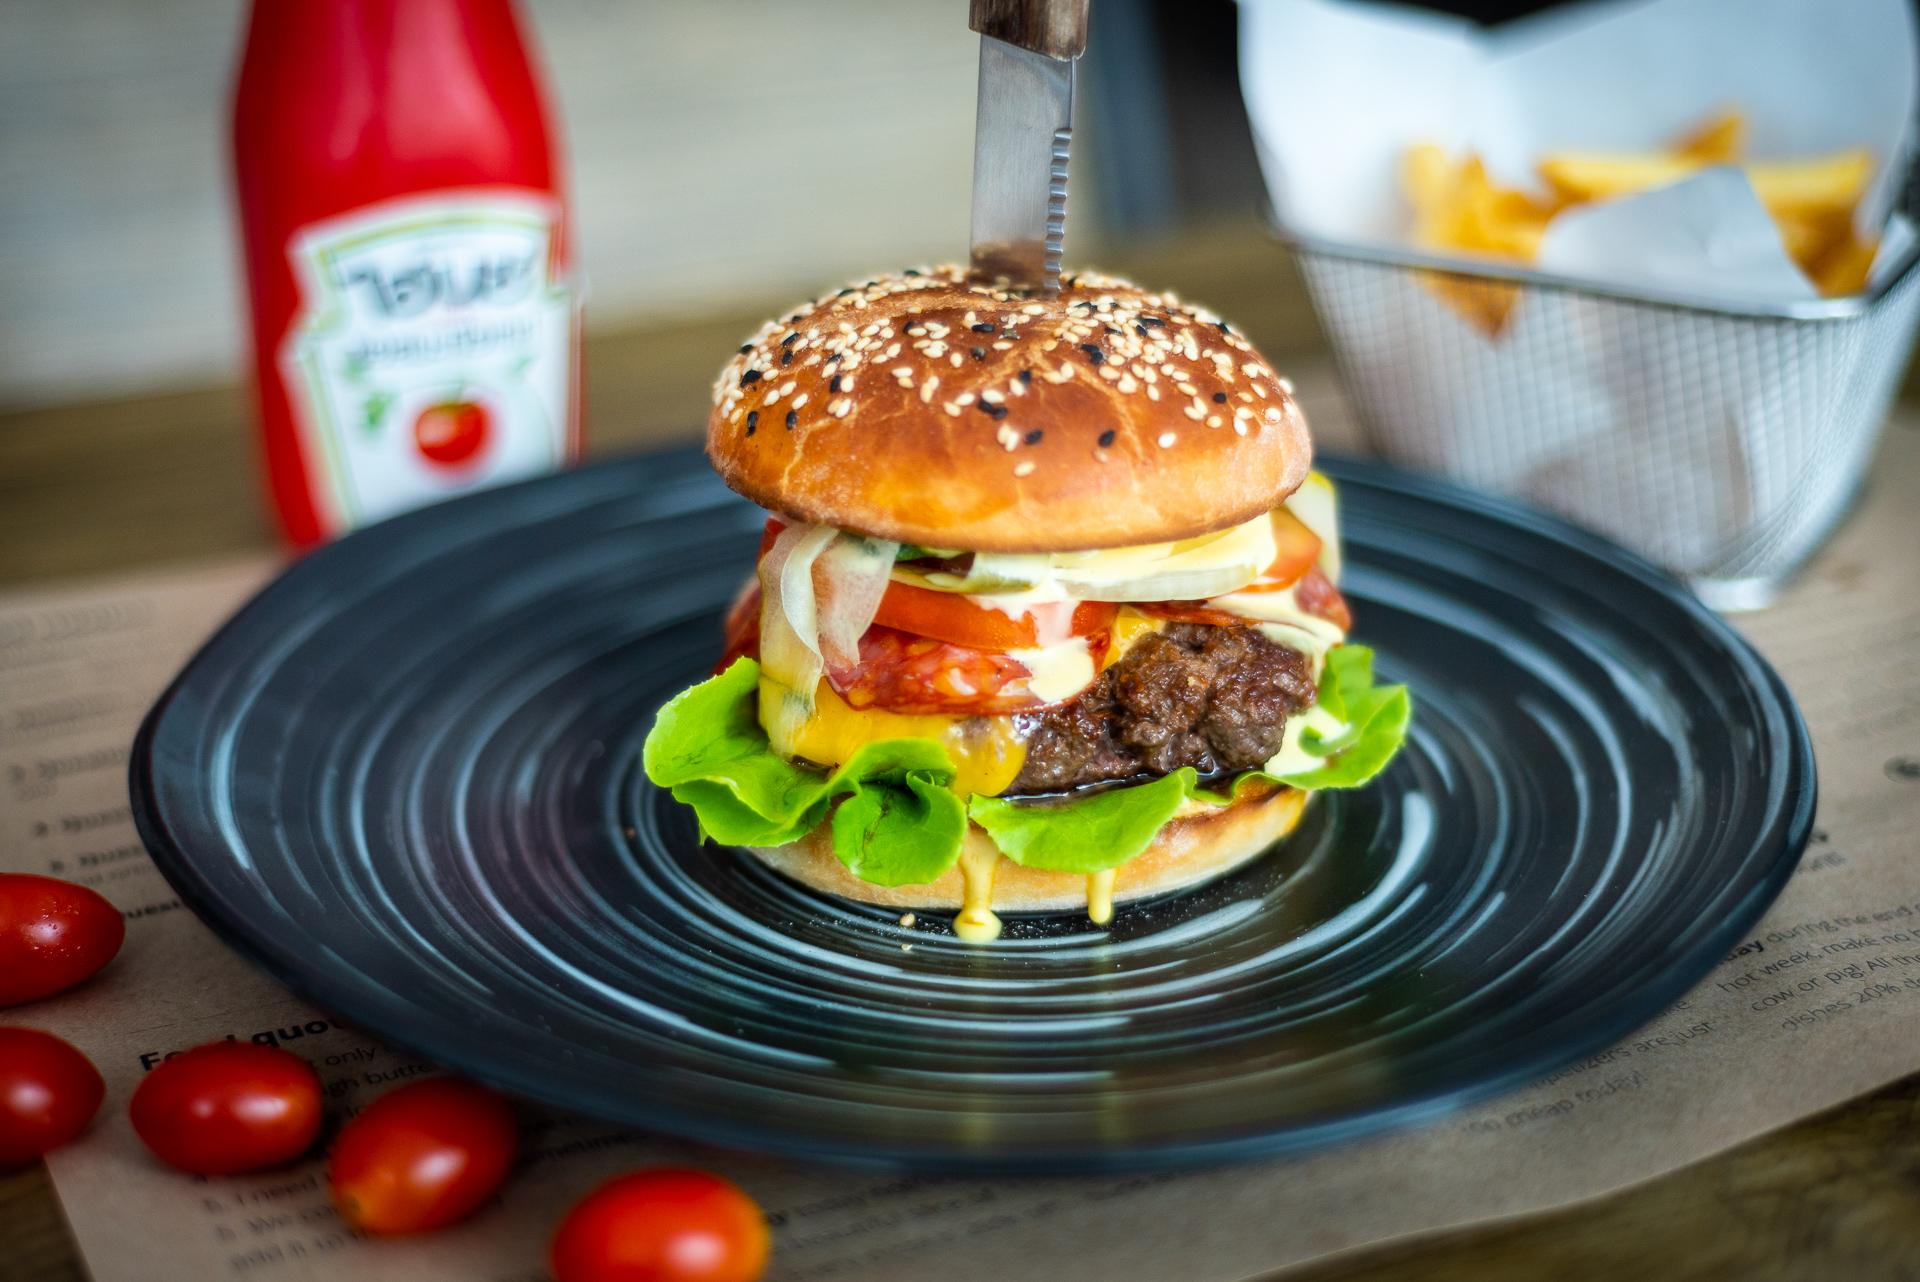 Classic wagyu beef burger